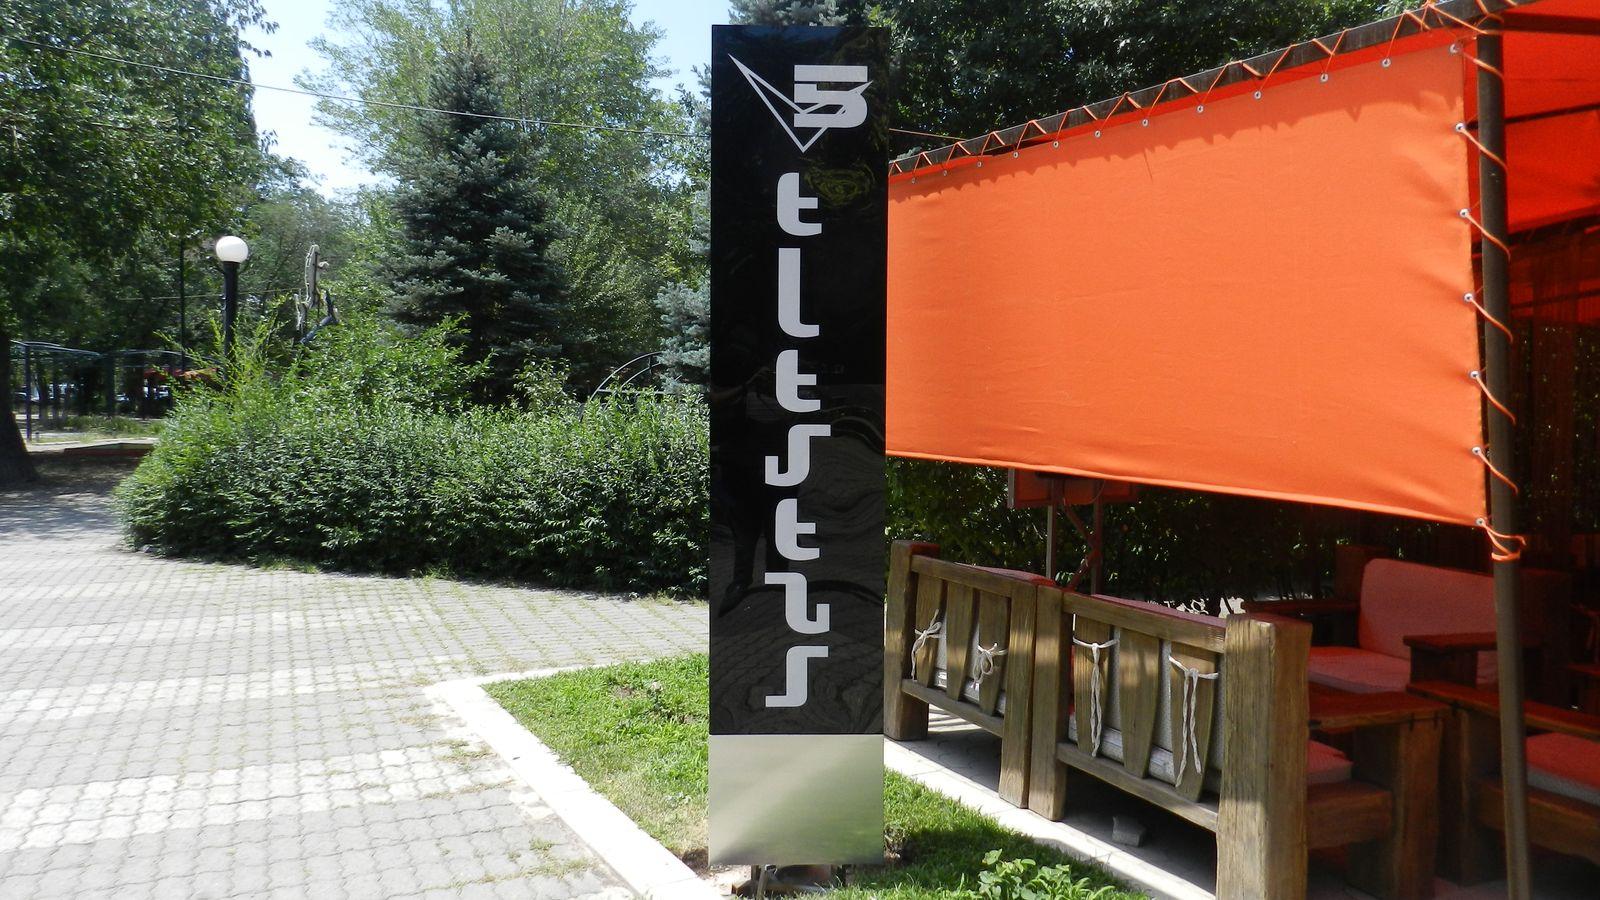 cafe pylon sign